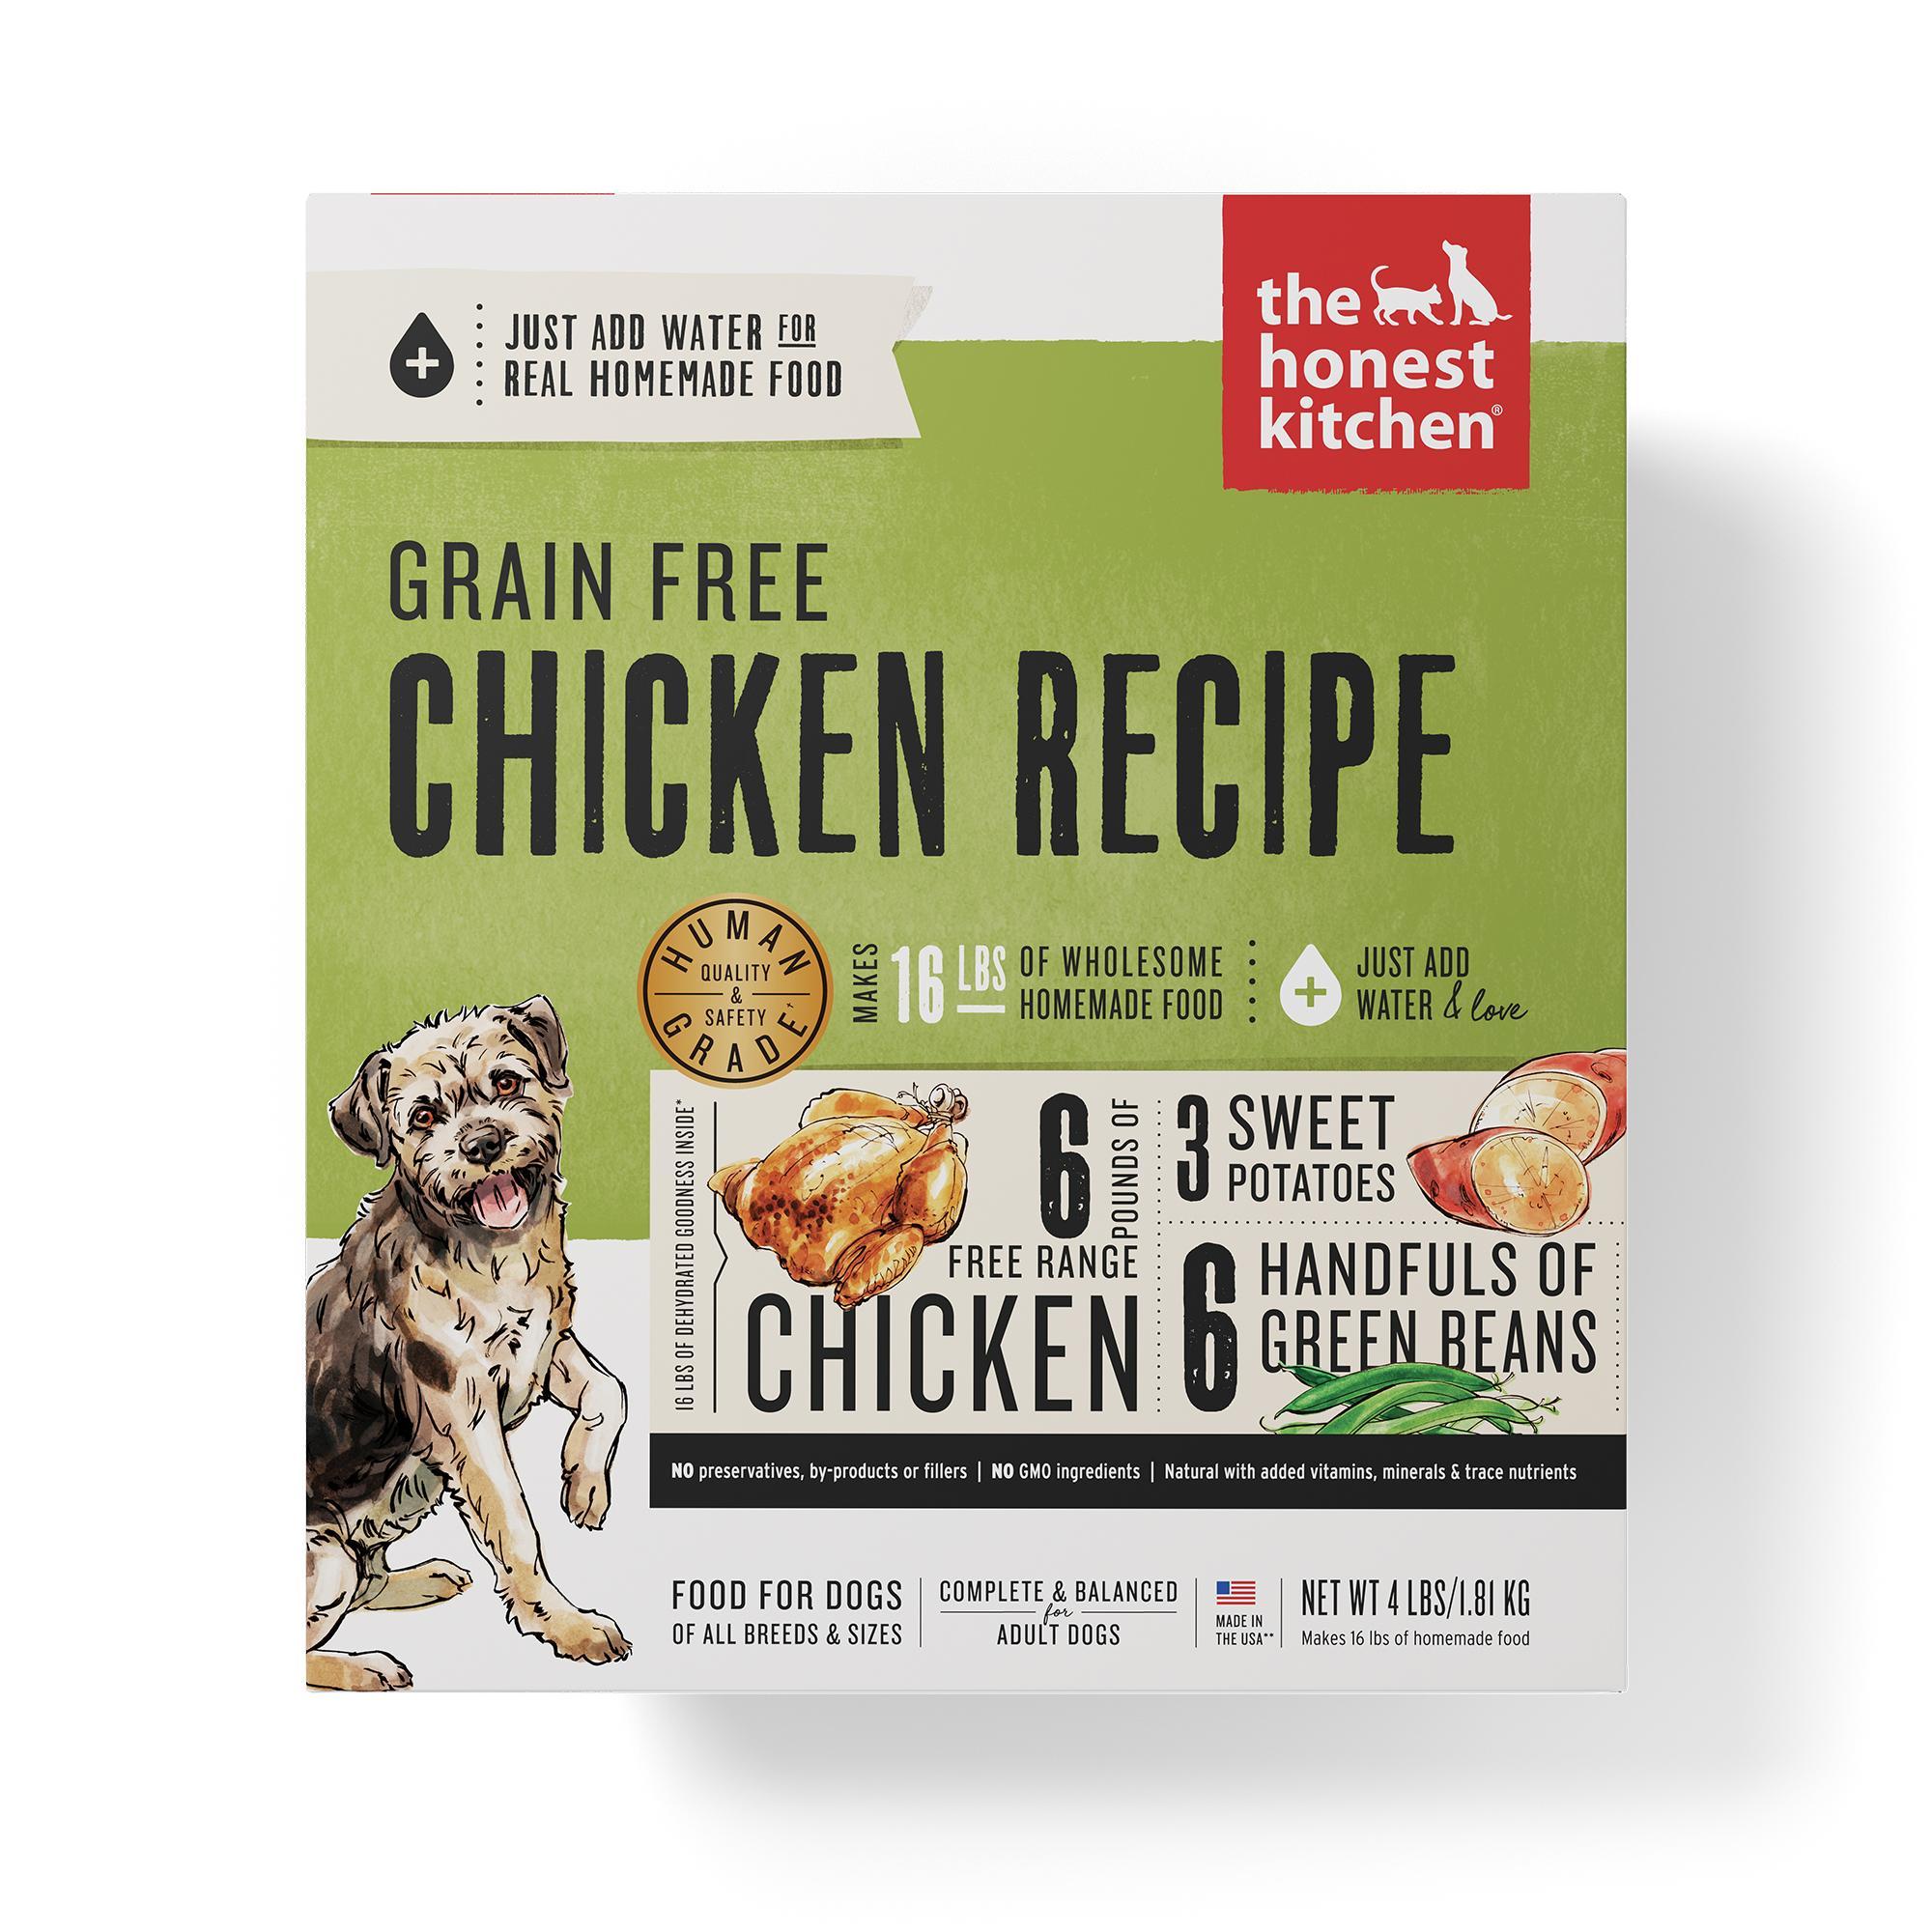 The Honest Kitchen Chicken Recipe Grain-Free Dehydrated Dog Food, 4-lb box